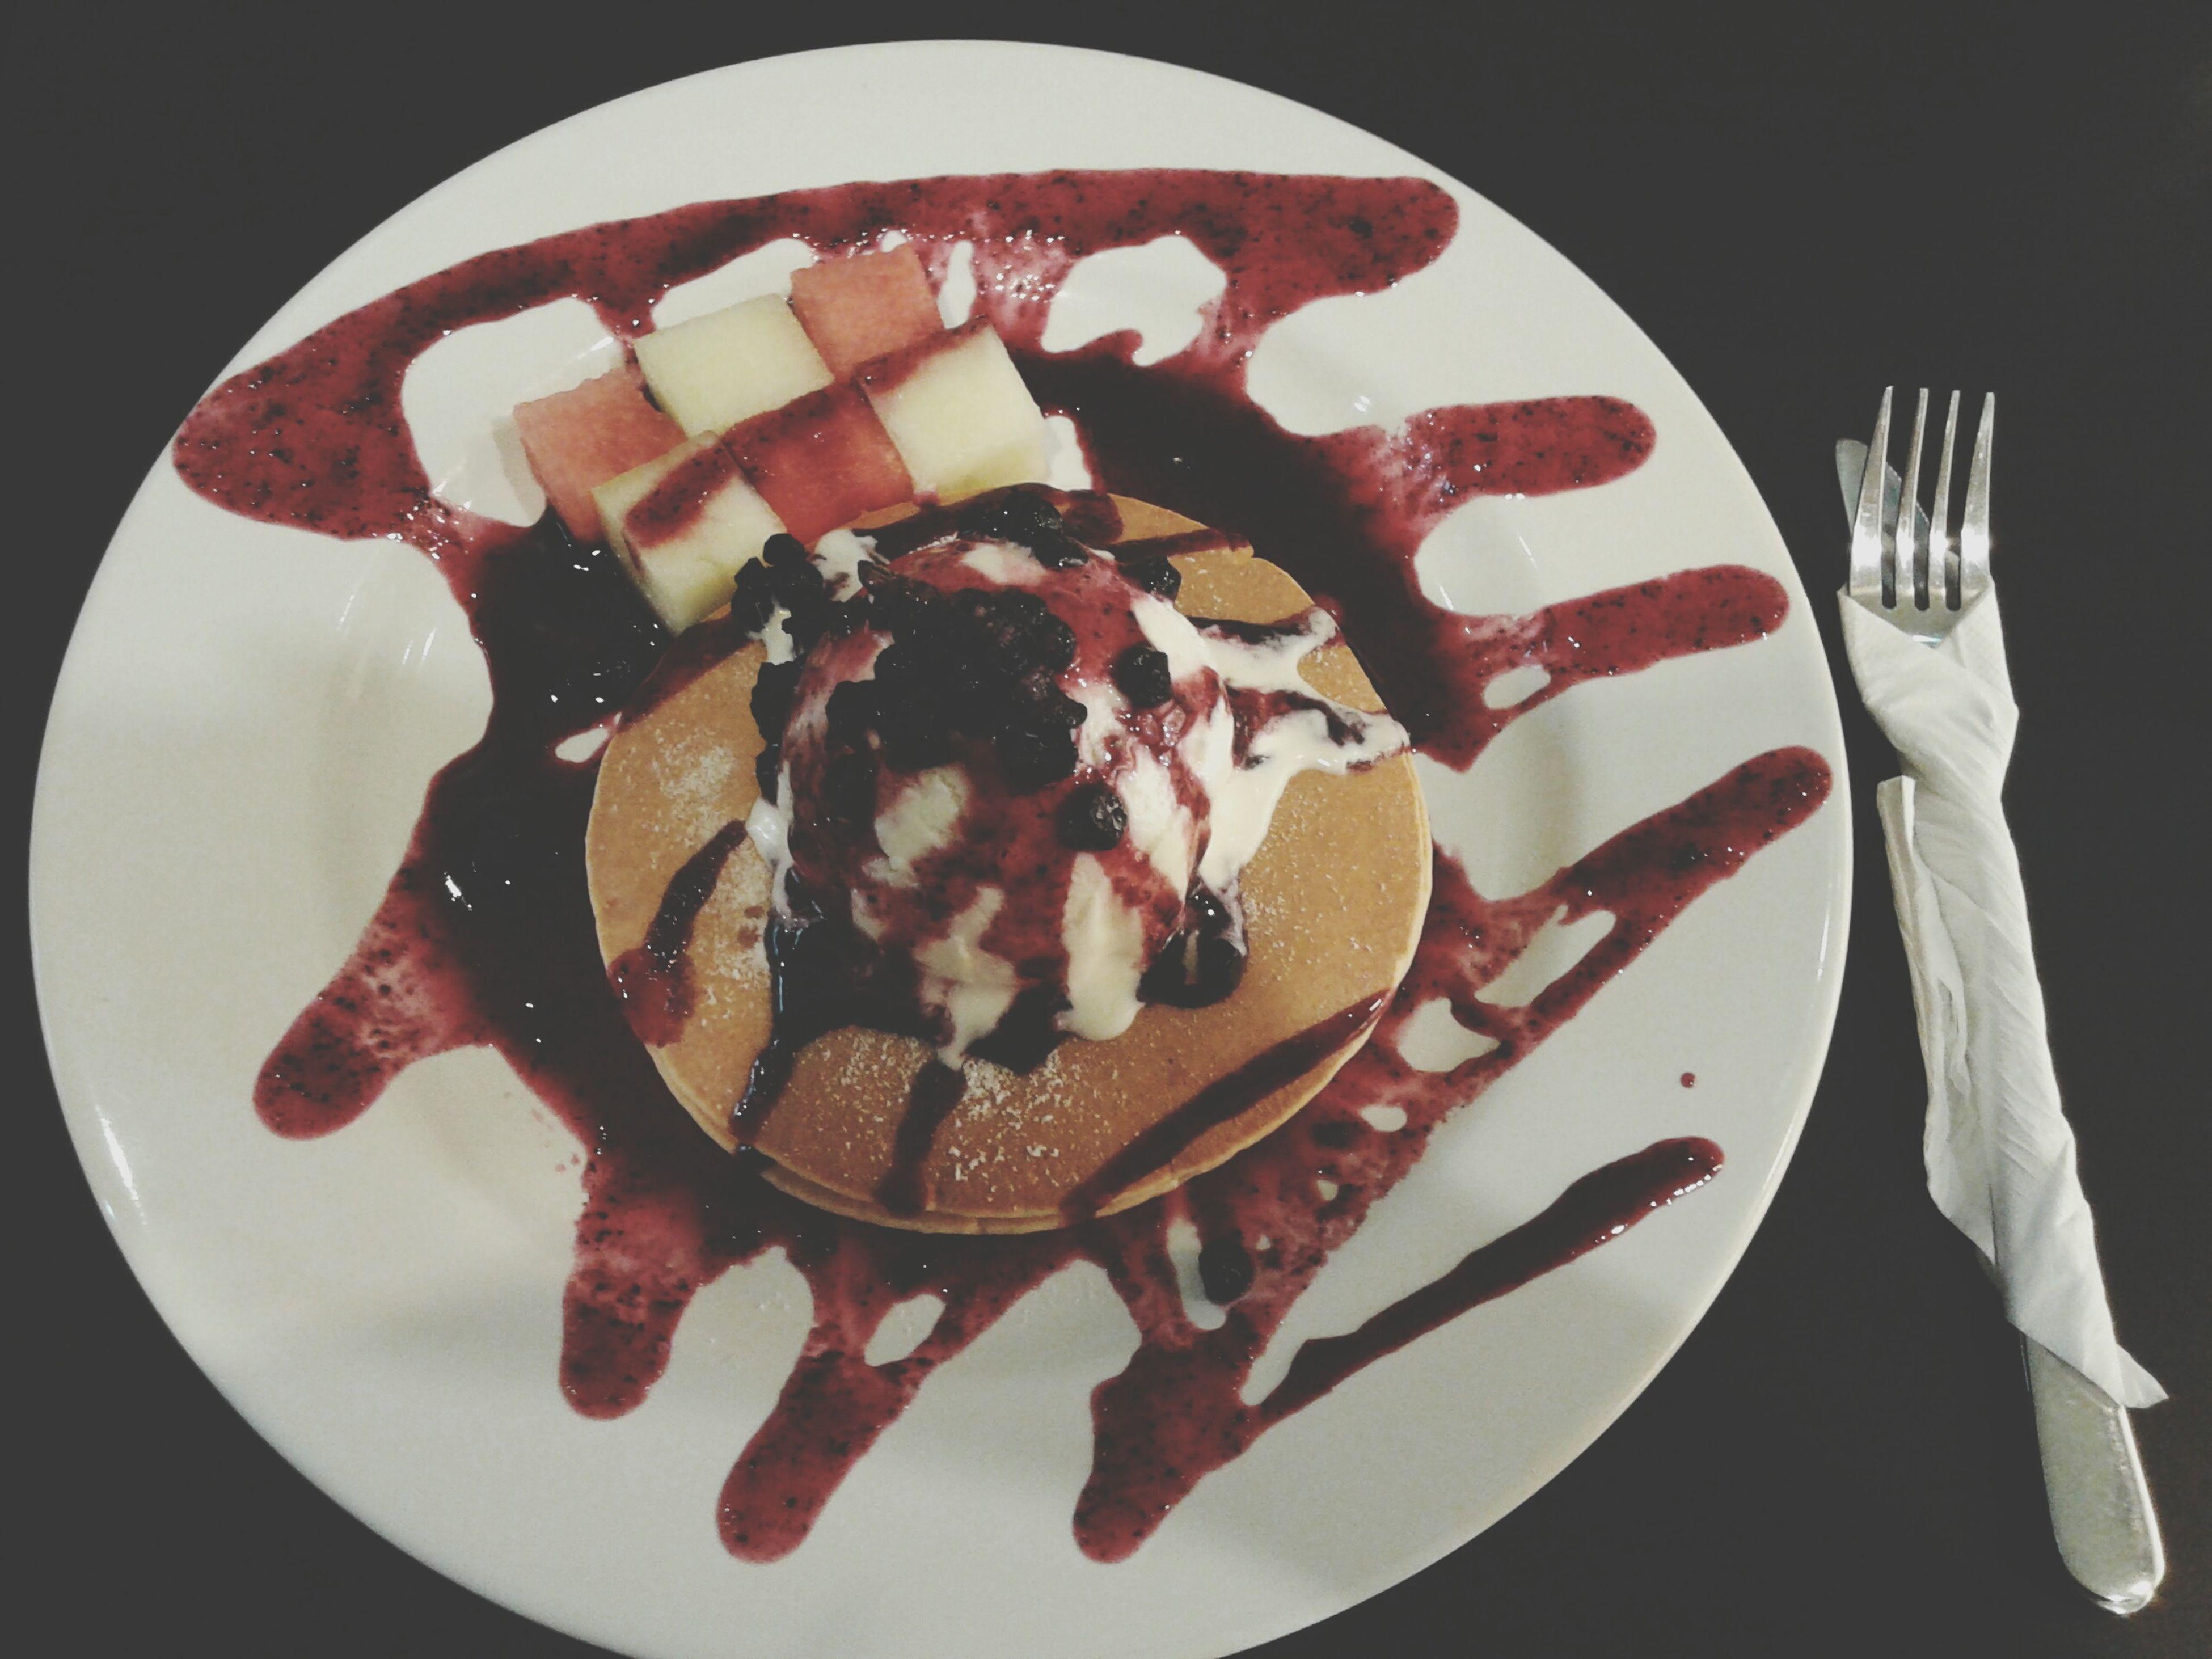 Blueberry Tango Pancake Food Foodporn Foodphotography EyeEm Indonesia Foodgasm Follow4follow Likeforlike Foodies